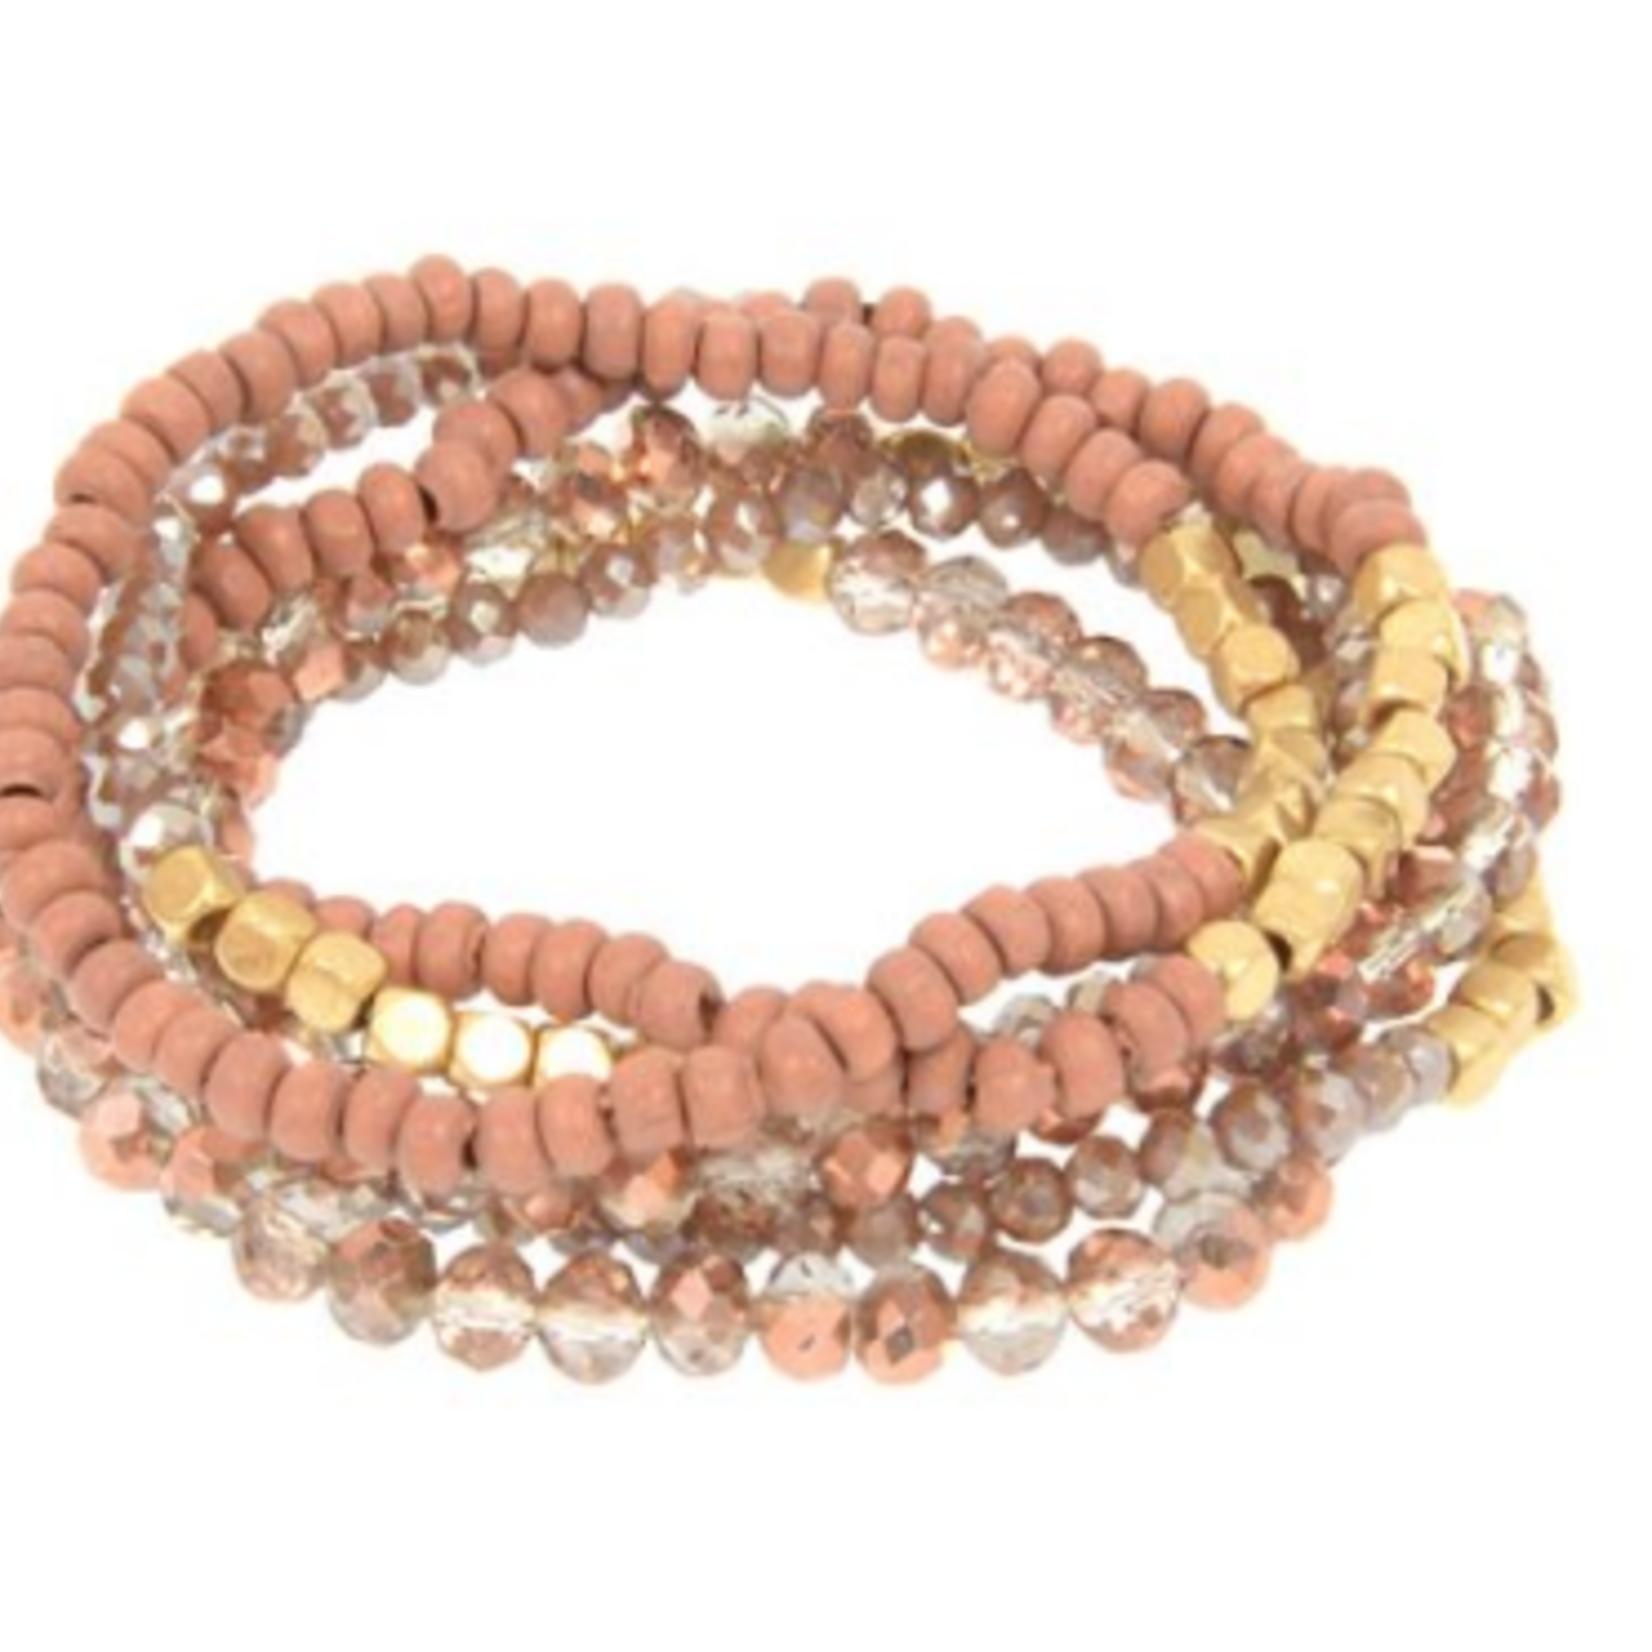 Joy Susan Joy Susan Mauve Glass & Wood Bead Bracelet